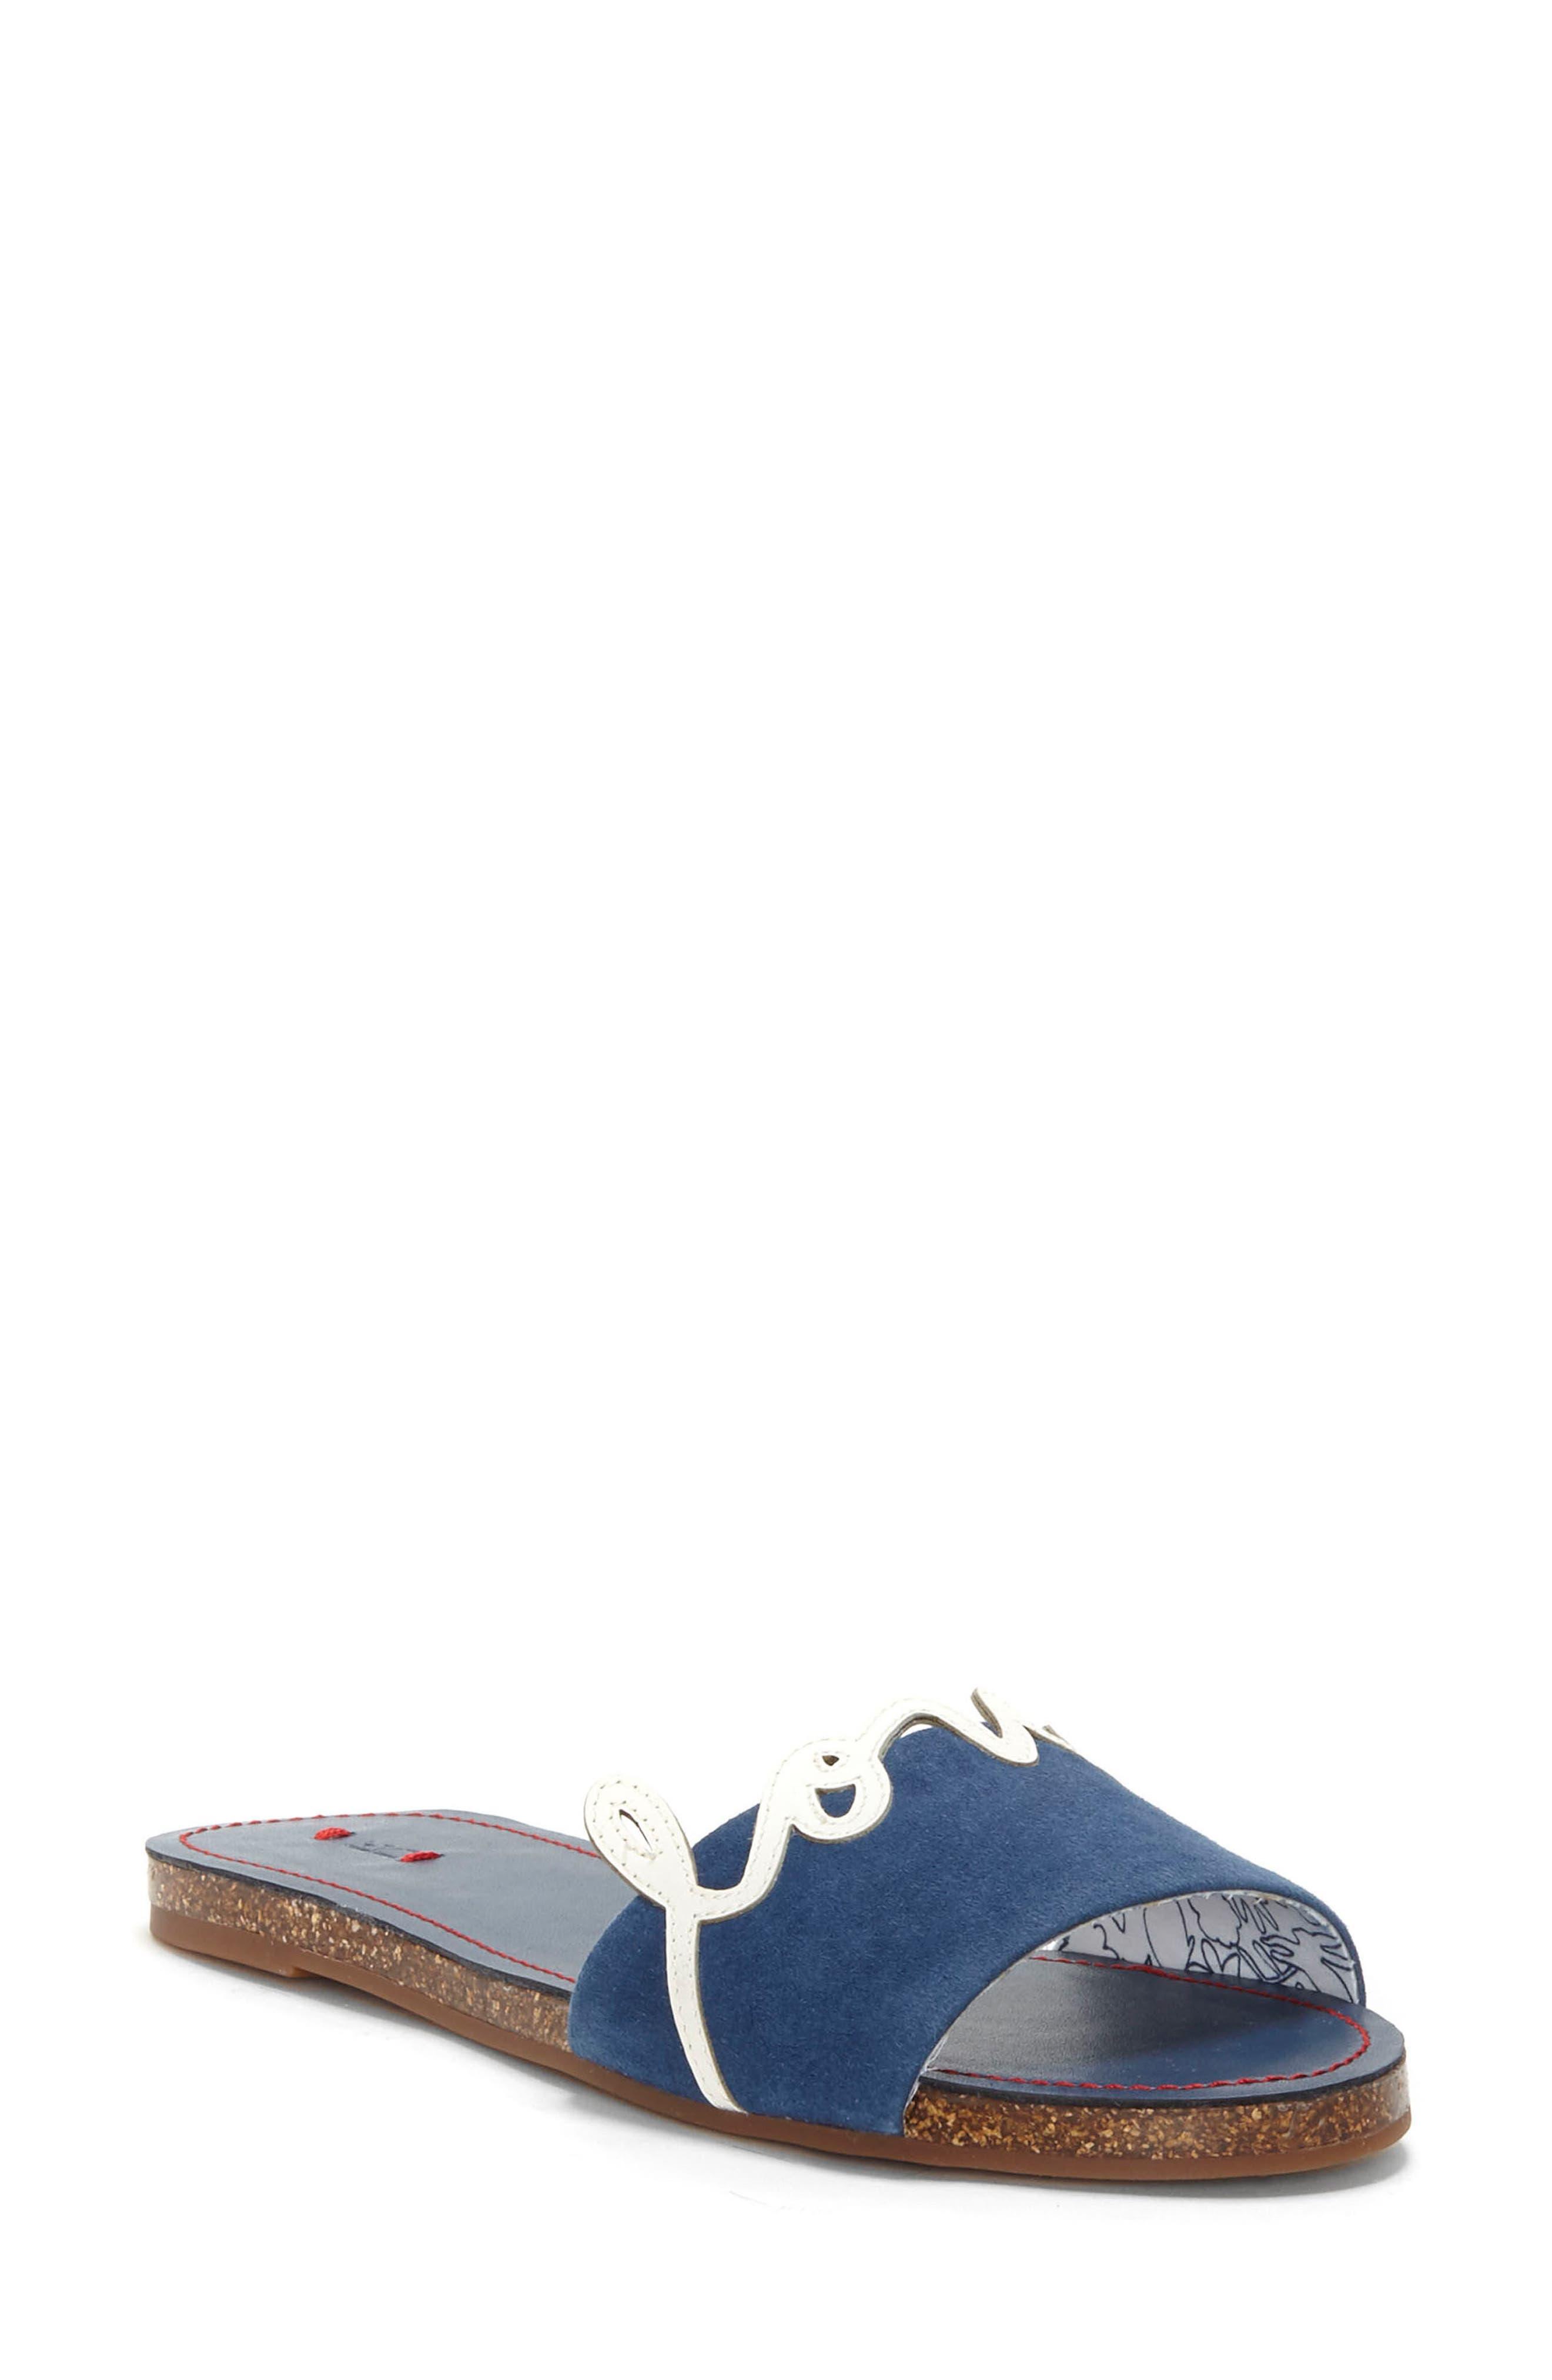 Sharlin Slide Sandal,                             Main thumbnail 1, color,                             Oxford Blue/ Milk